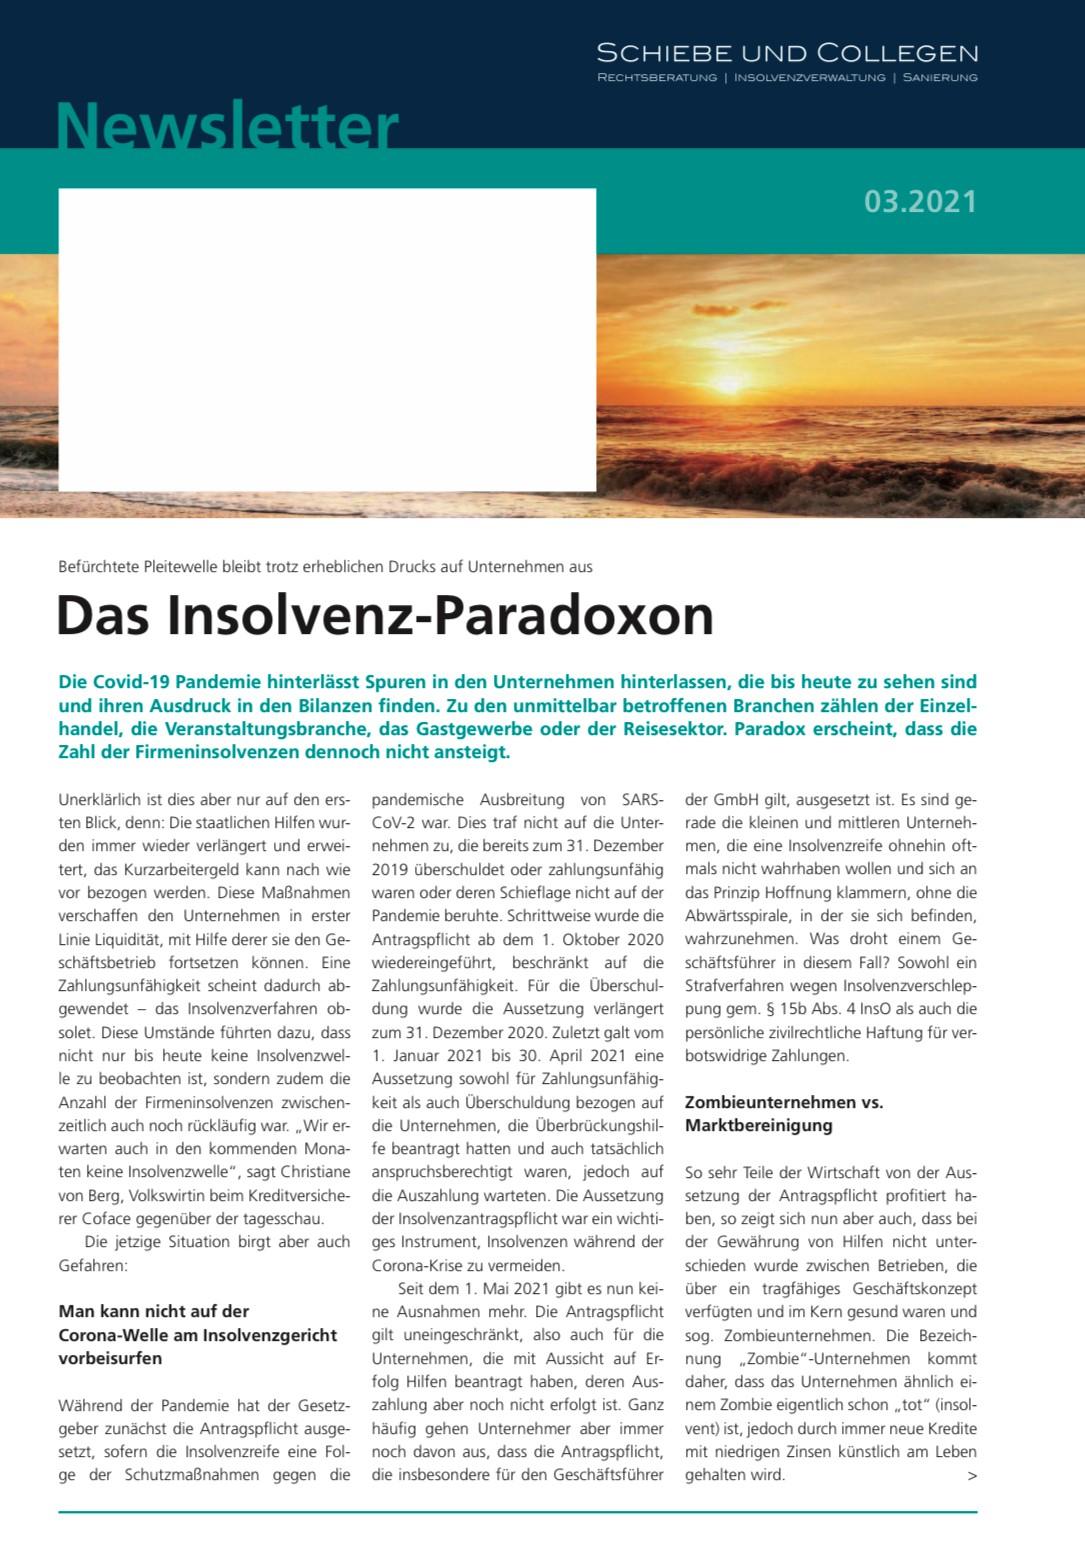 Das Insolvenz-Paradoxon